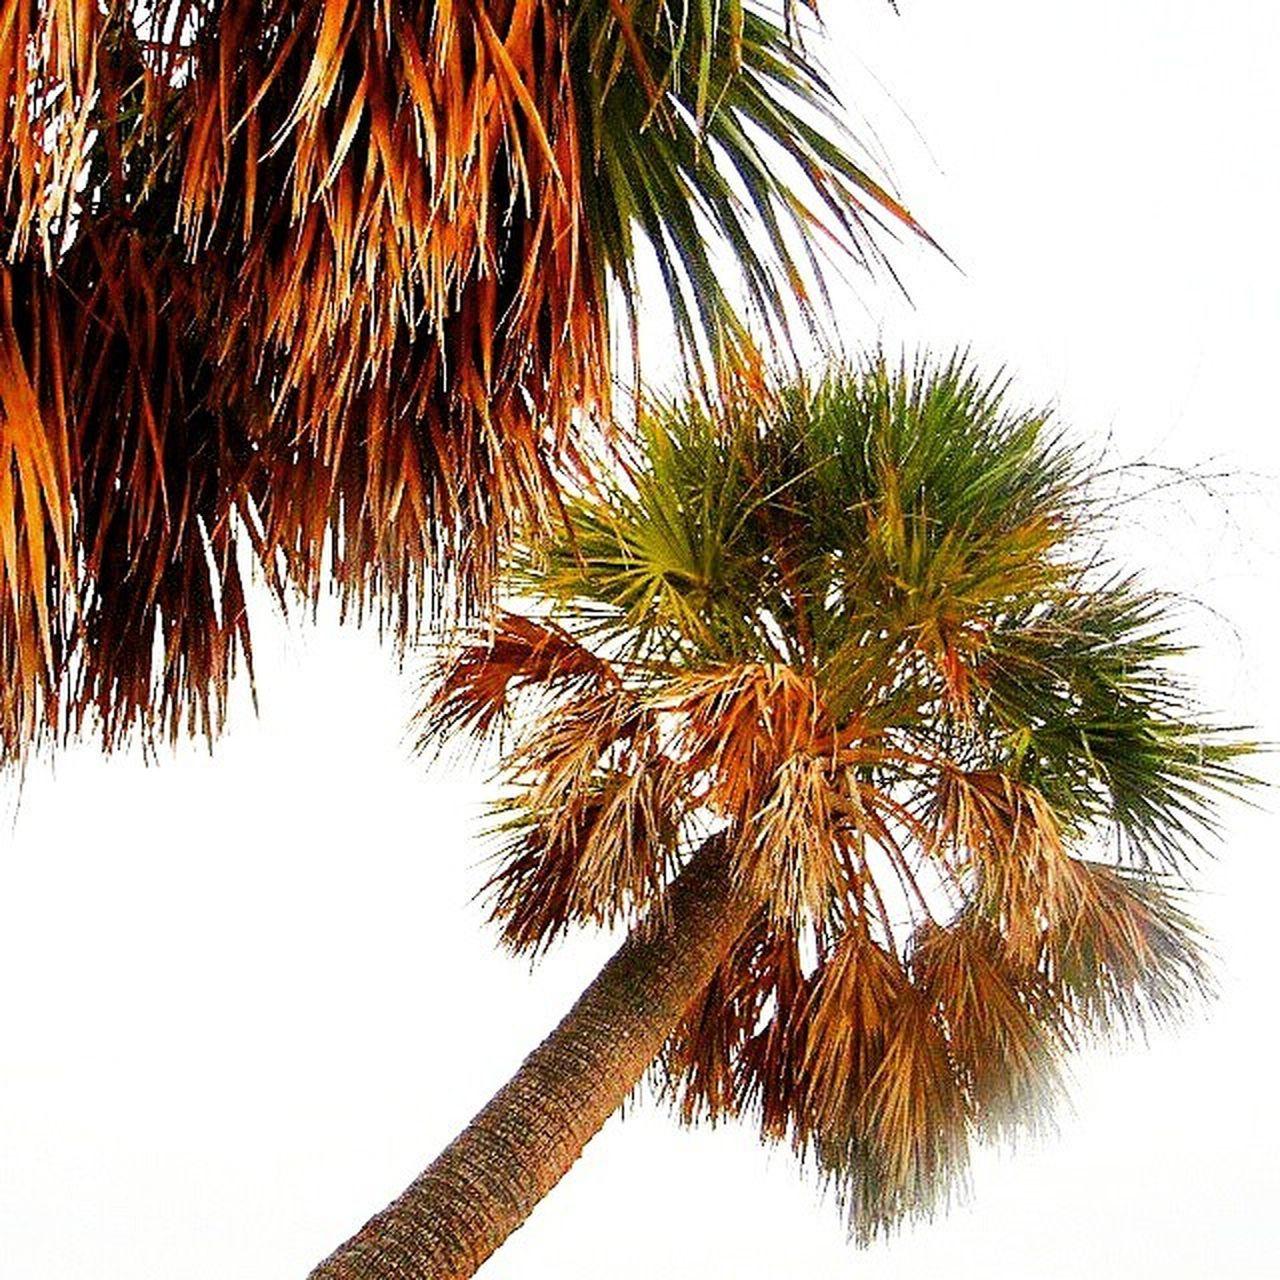 Palm City✌ Princely_shotz Precious_shotz Ig_captures Mycapture infinity_shotz alalamiya_mystics all_shots fotografdukkanim alalamiya allnatureshots ig_naturegallery skysultans nature_sultans natureelite shot_flair ig_all_americas majestic_earth insta_souls ig_naturelovers natureelite igs_world igs_asia igs_africa majestic_earth ig_eurasia ig_mood ig_today loves_bestpic loves_bestsky worldclassshots nature stellar_shots